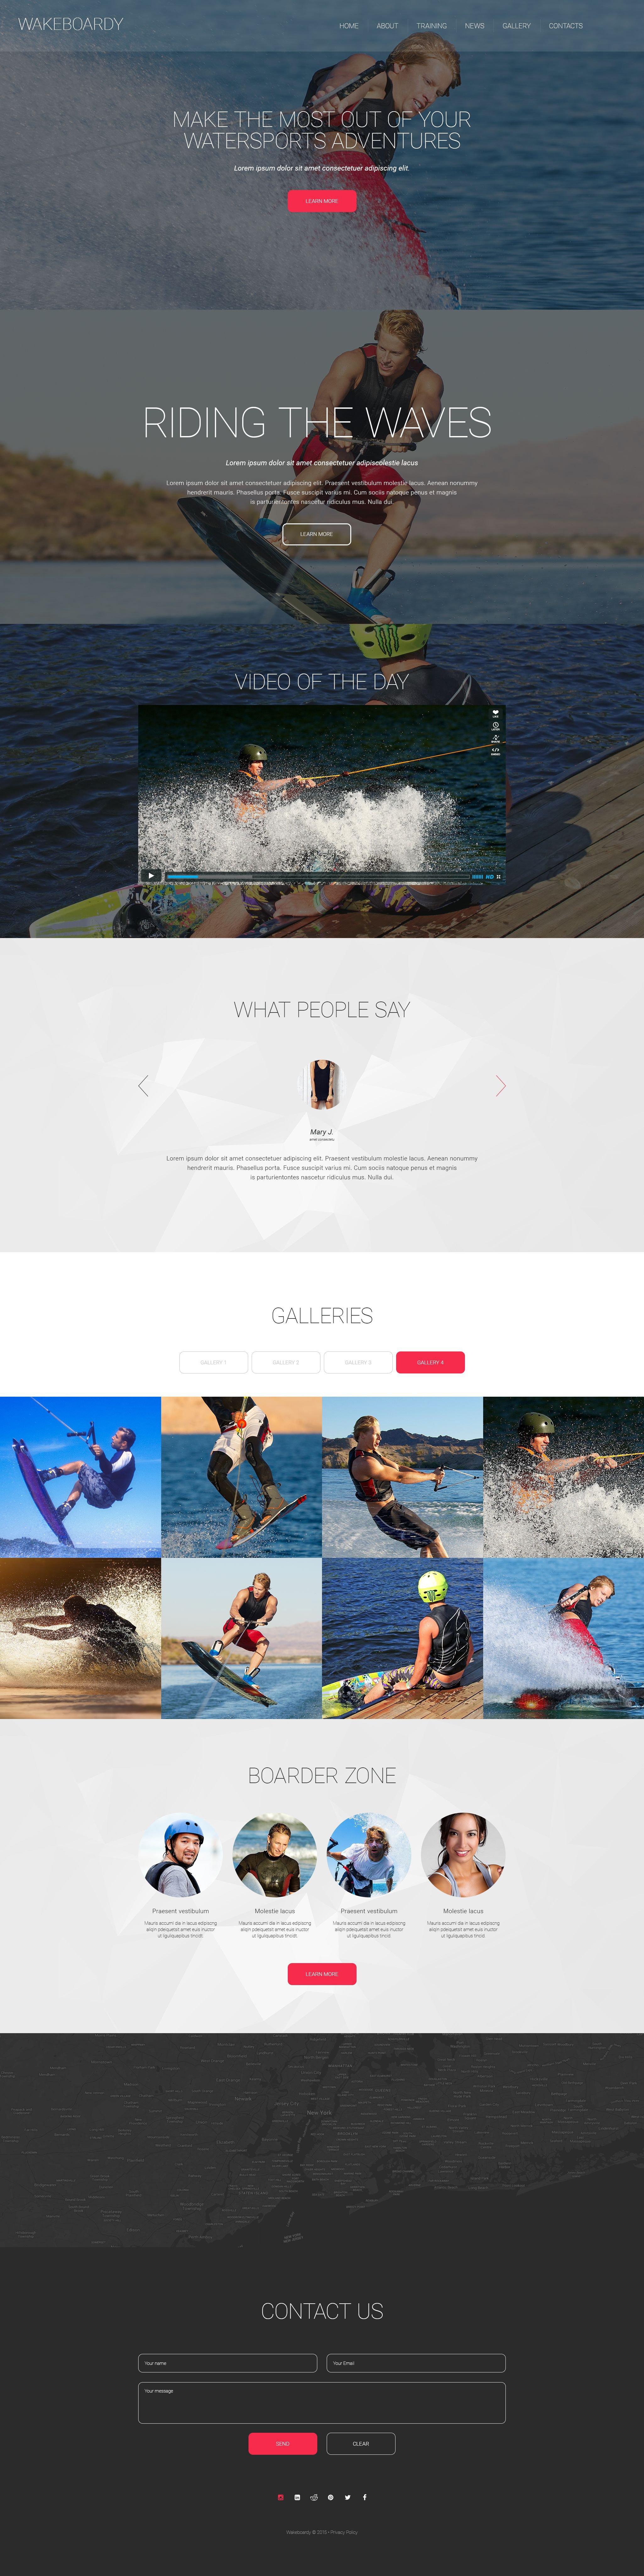 Wakeboardy Website Template - screenshot